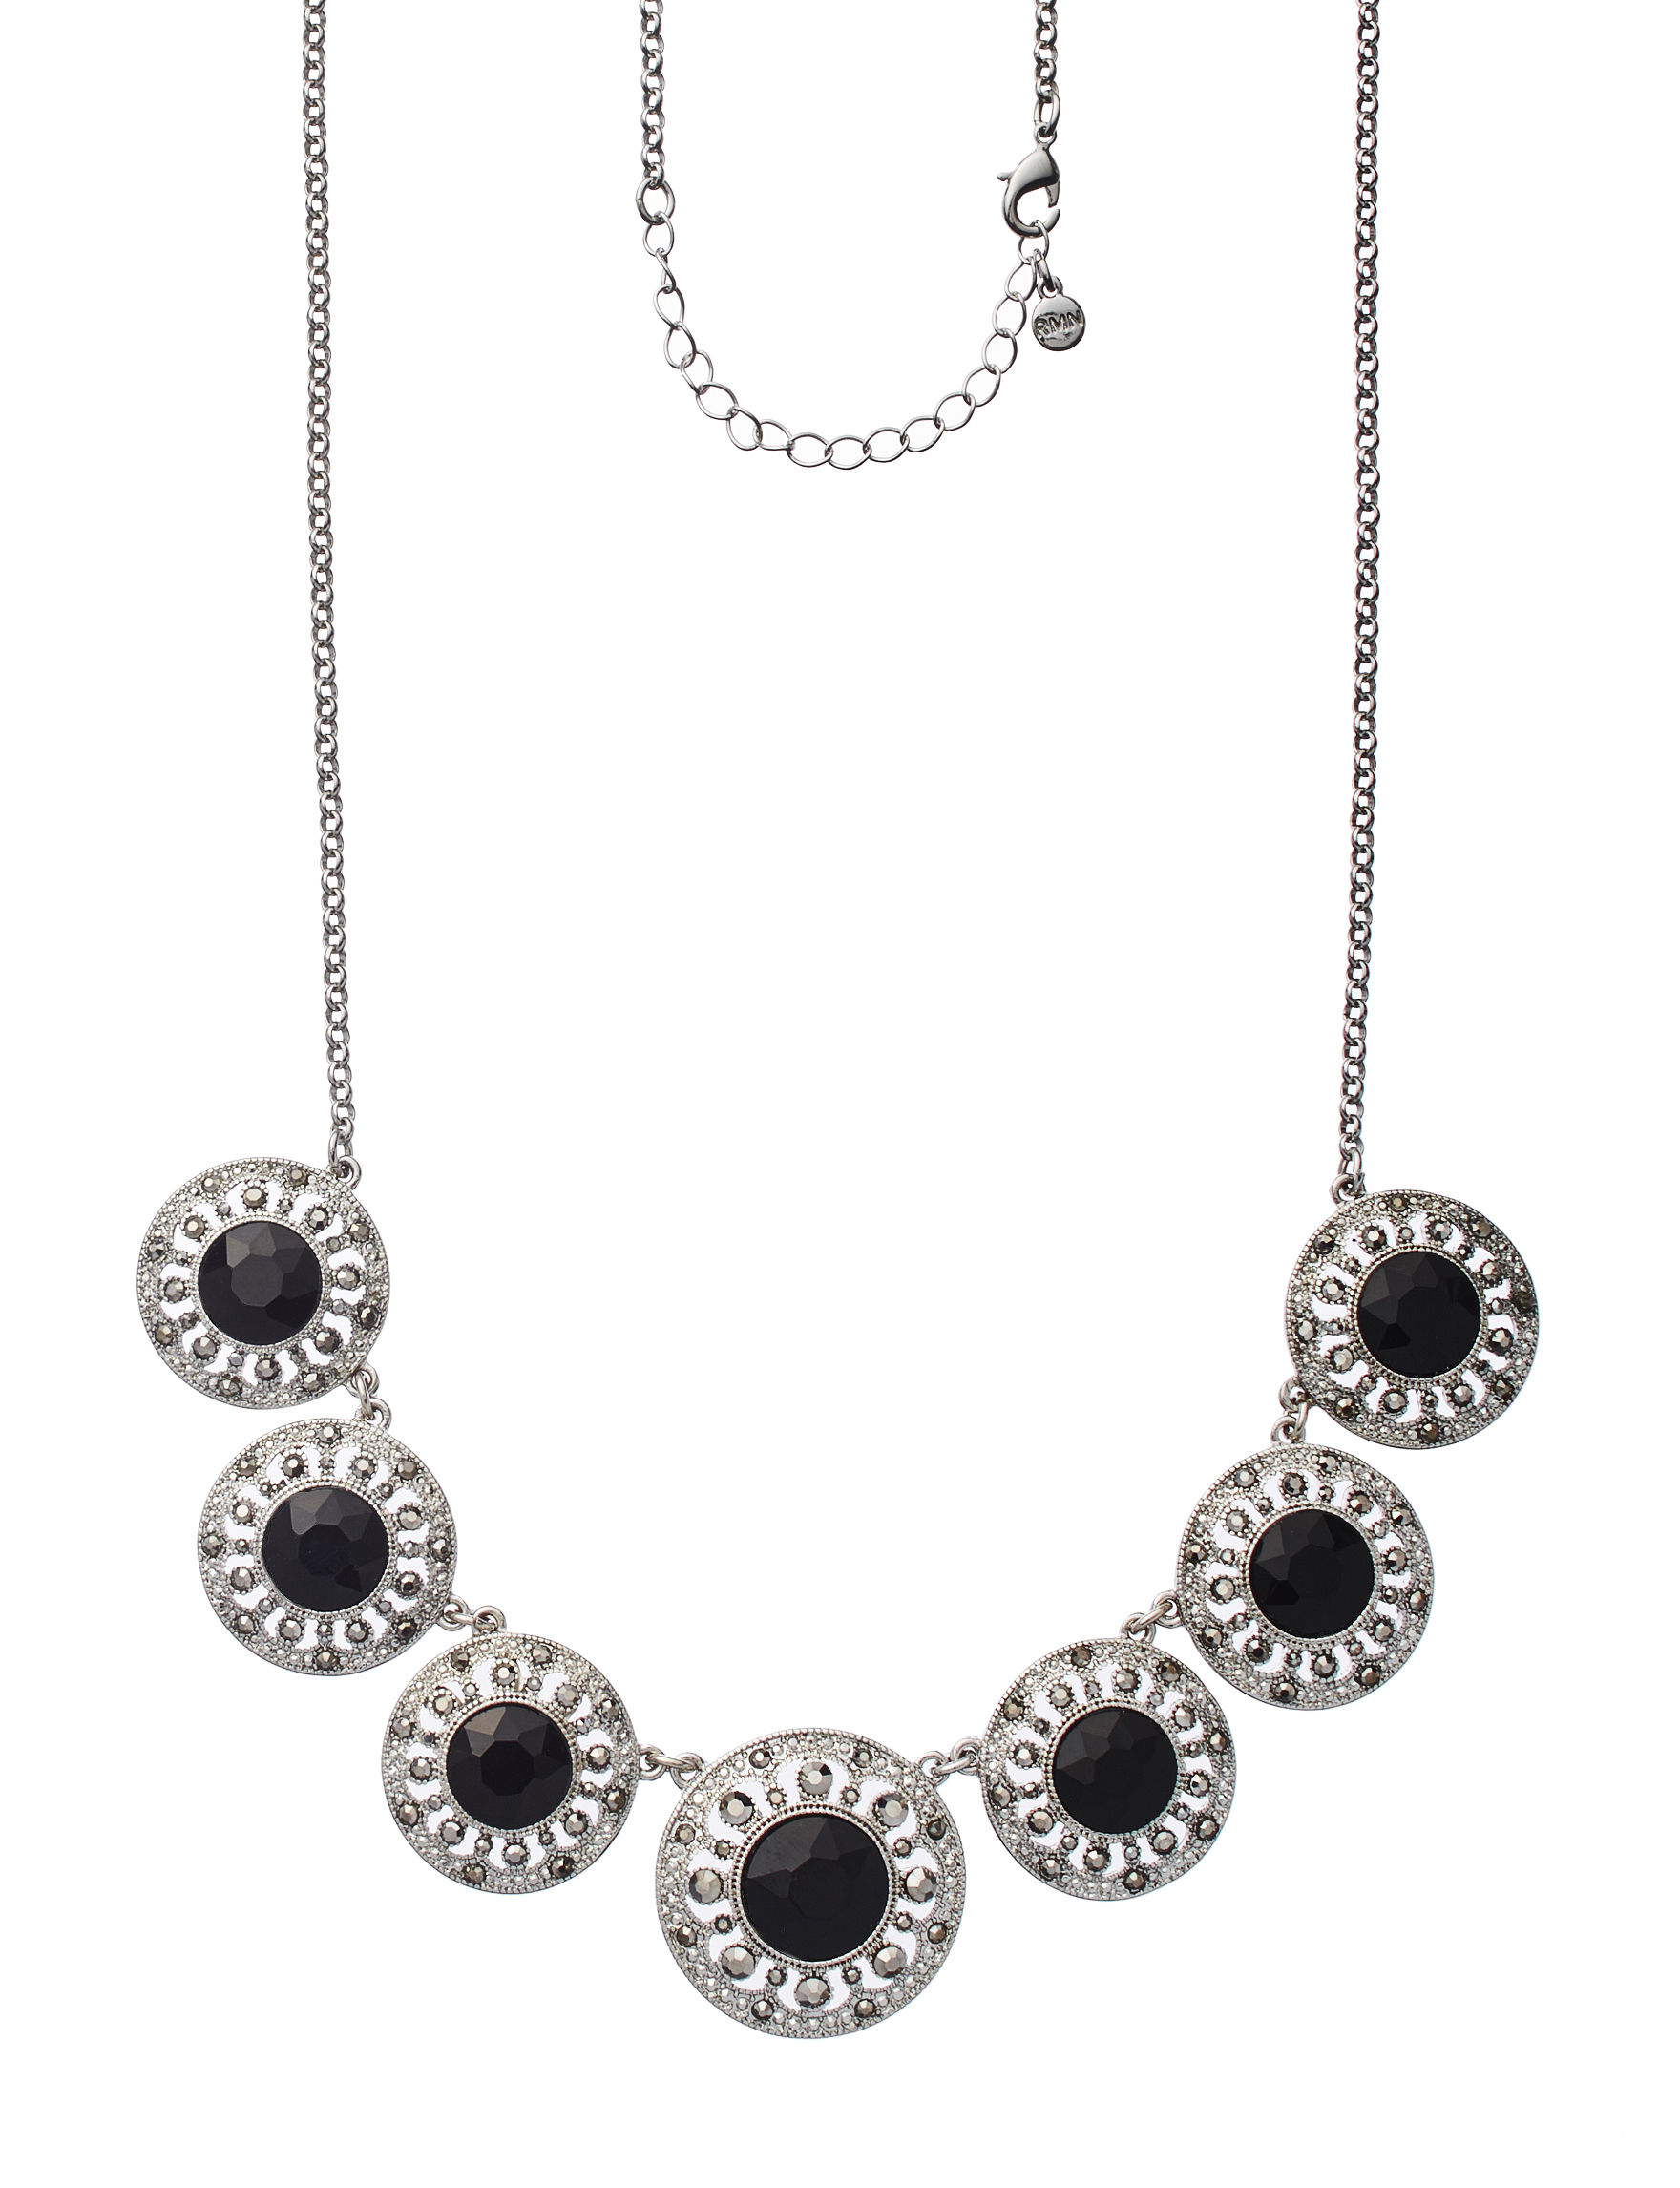 Roman  Necklaces & Pendants Fashion Jewelry